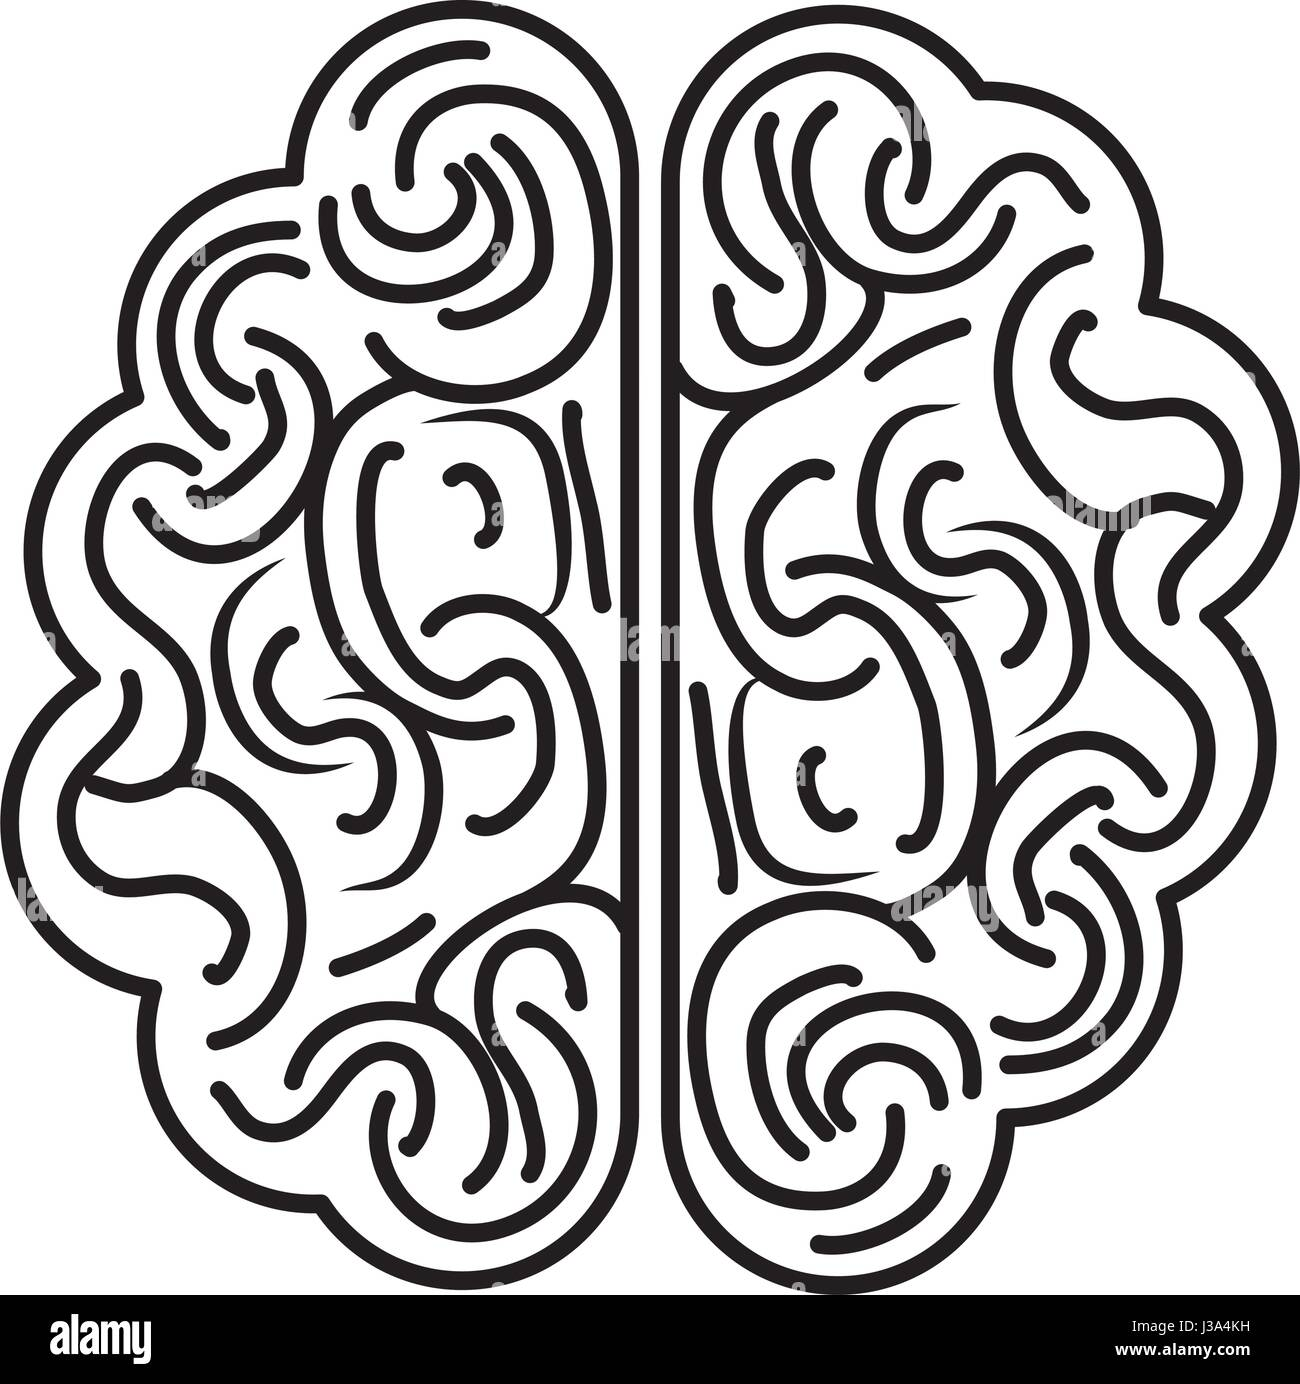 Isolated brain organ design - Stock Image